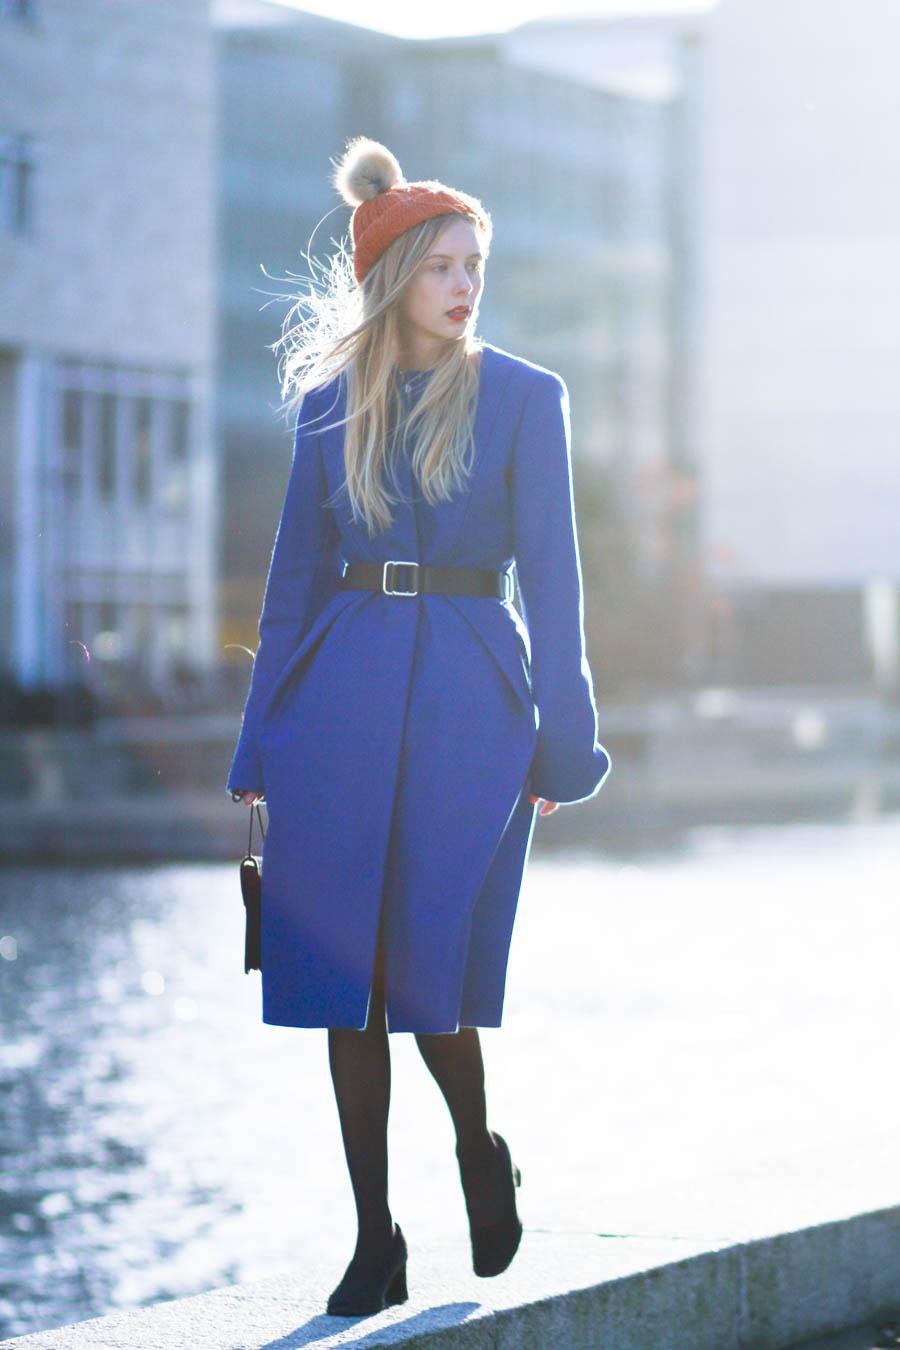 outfit December nemesis babe marie jensen danish blogger -2-2